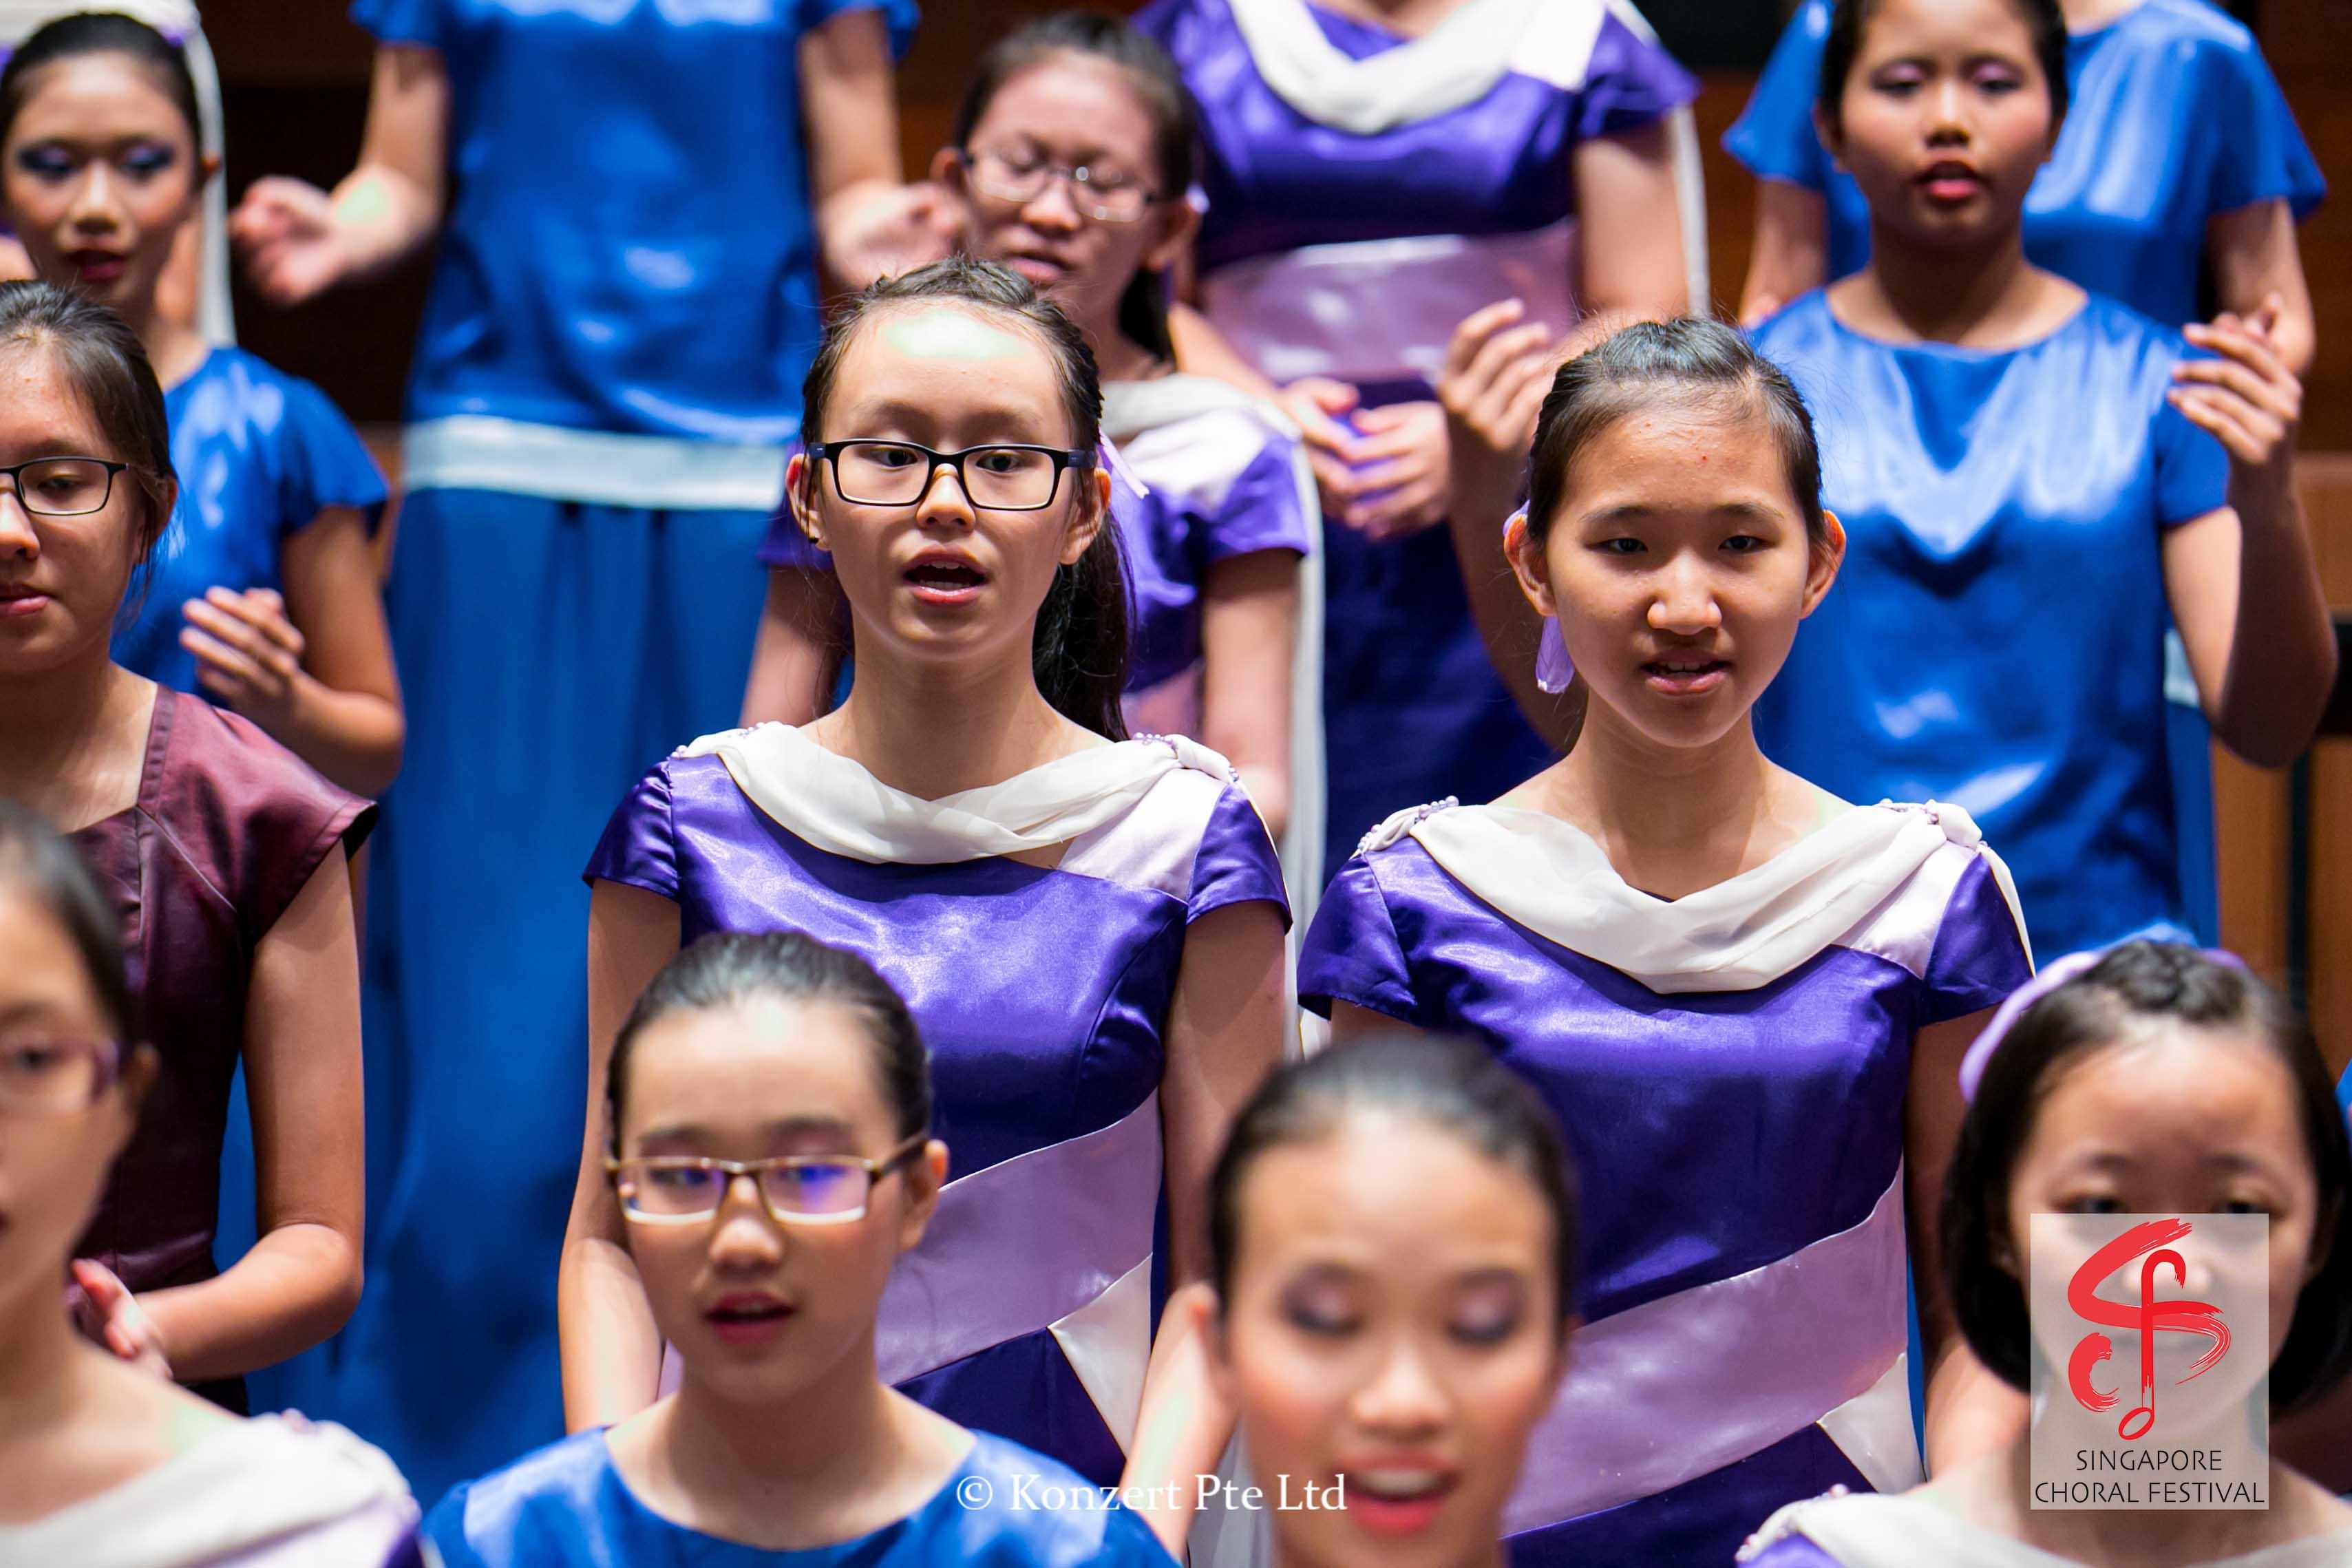 Singapore Choral Festival 7-8-15 (94).jpg